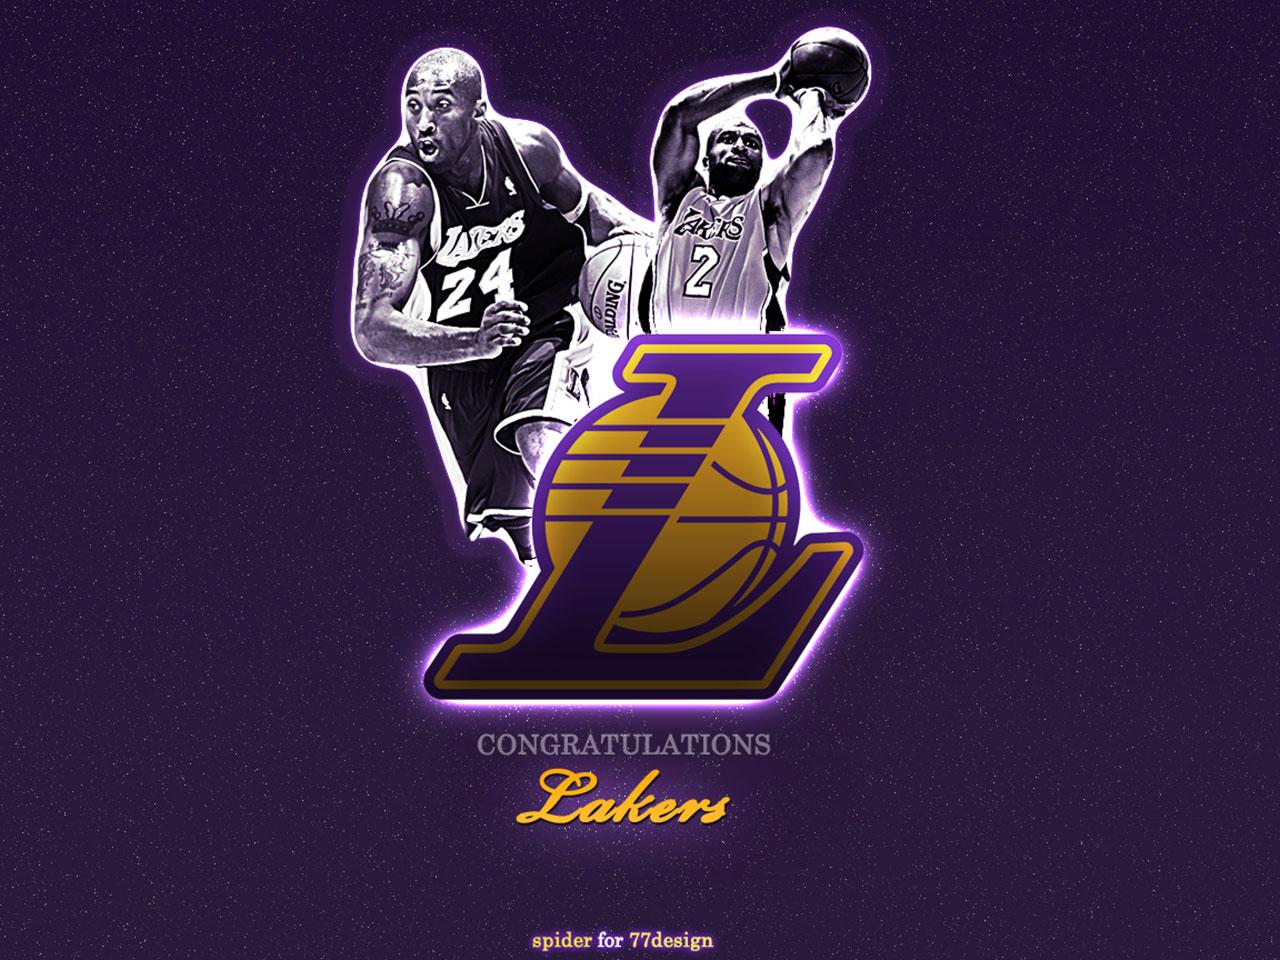 http://1.bp.blogspot.com/_FUqunw1CcGY/TQ5LeWg__eI/AAAAAAAAAcU/xsNJKplmc3s/s1600/Lakers-2009-NBA-Champs-Wallpaper.jpg